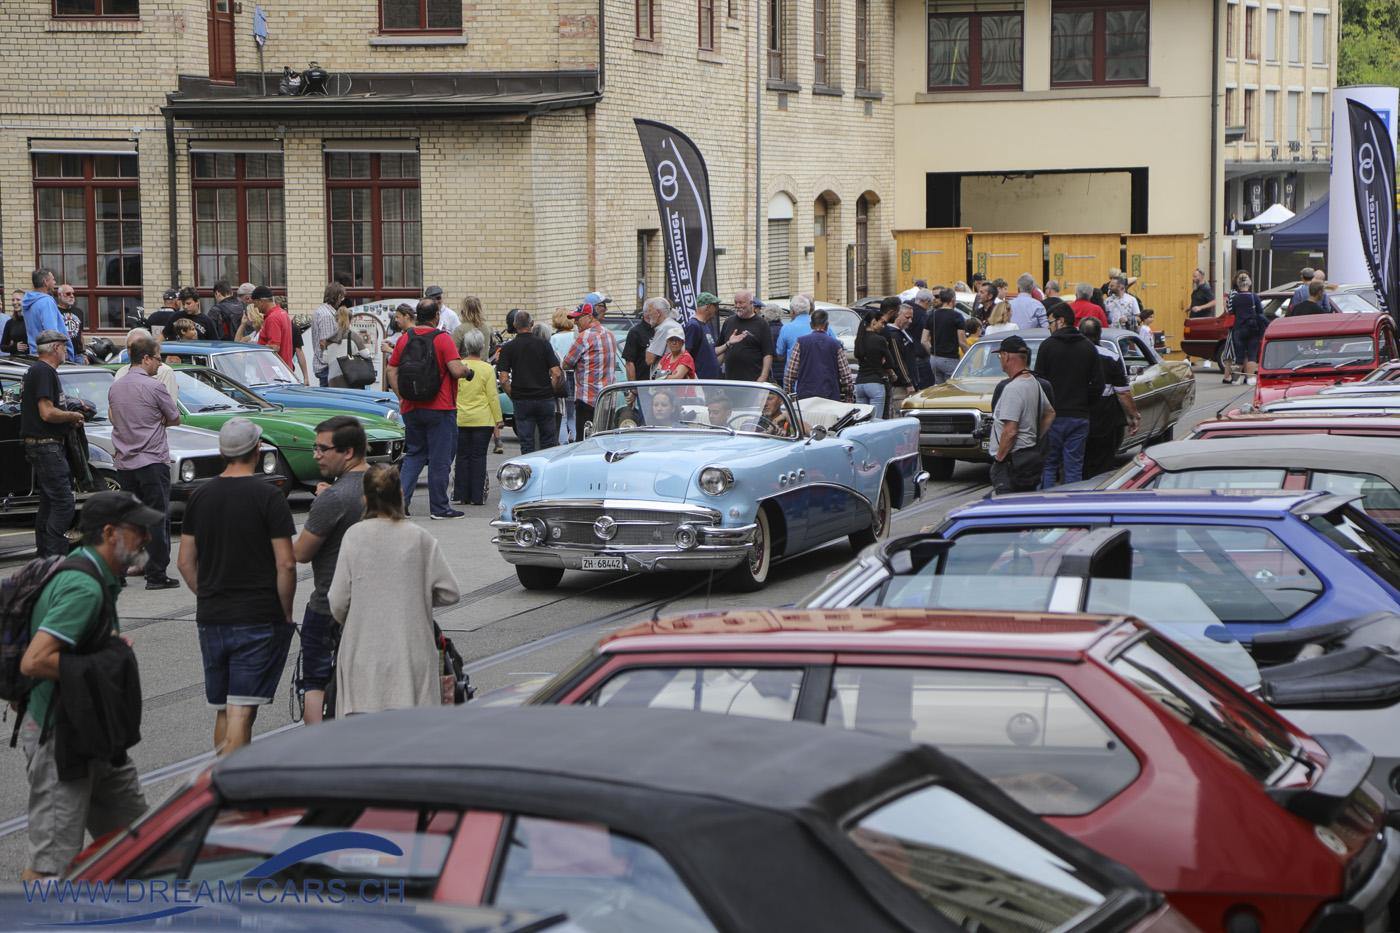 4. Older Classics, 12. September 2021, MOTORWORLD / The Valley, Kemptthal. Wieder Grossandrang mit weit mehr als 1'000 Fahrzeugen